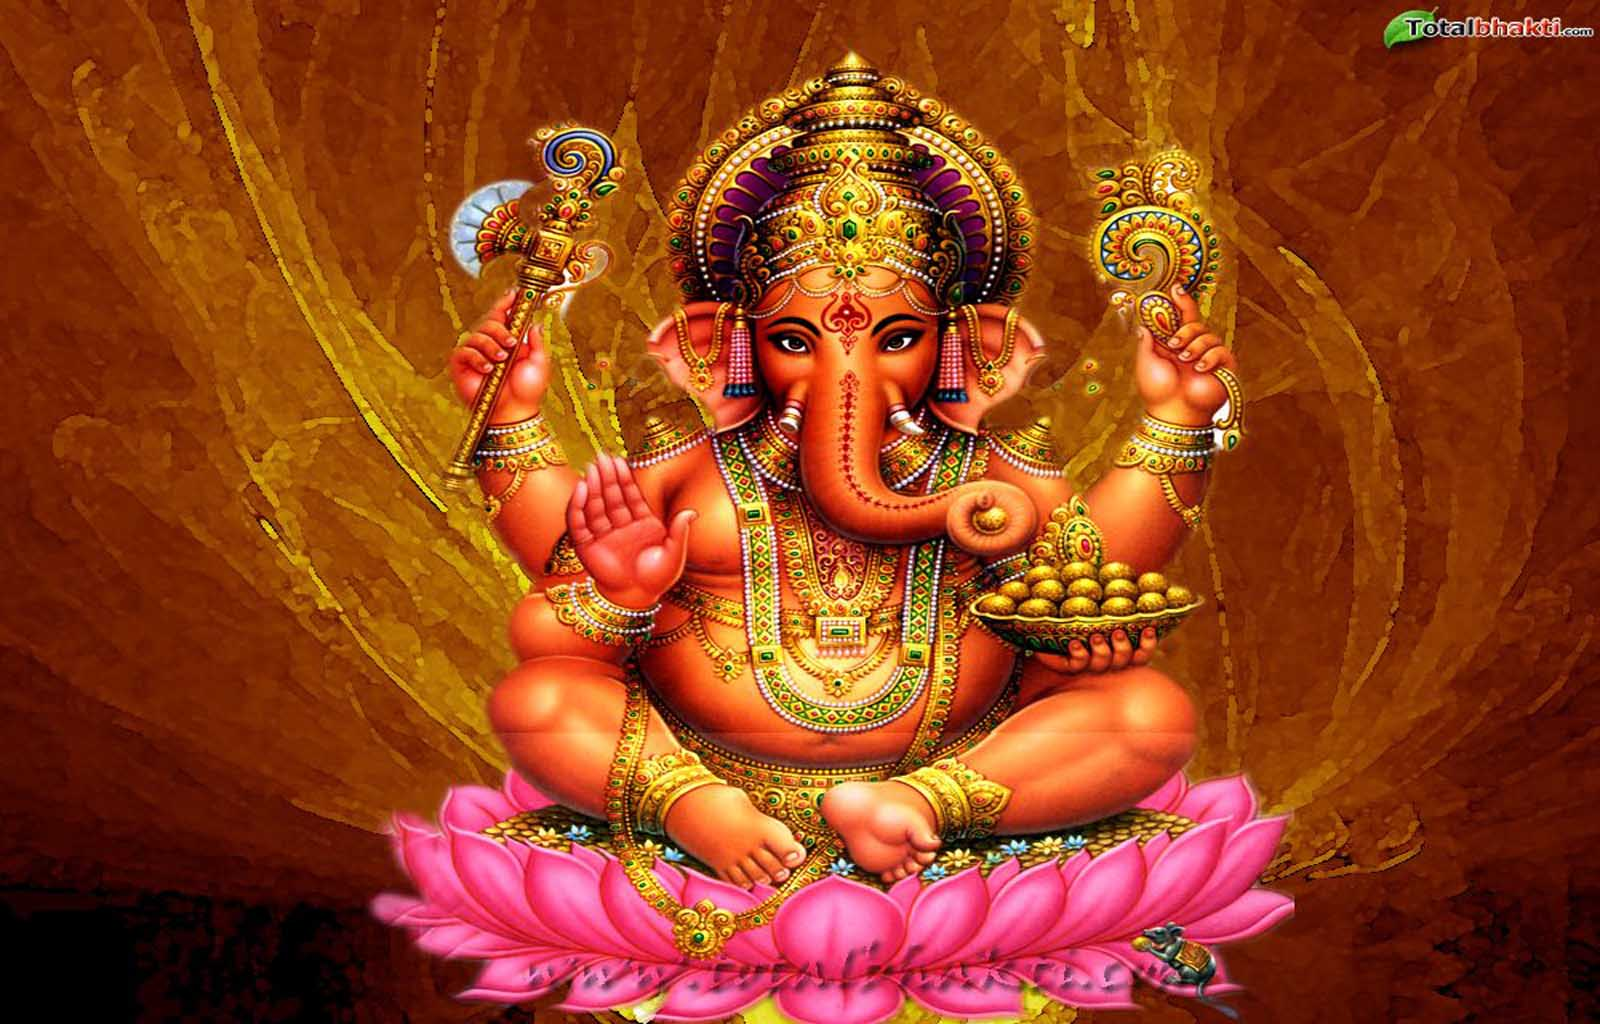 Cute Ganesh Hd Wallpaper Hare Krishna Shri Ganesh Wallpaper 8